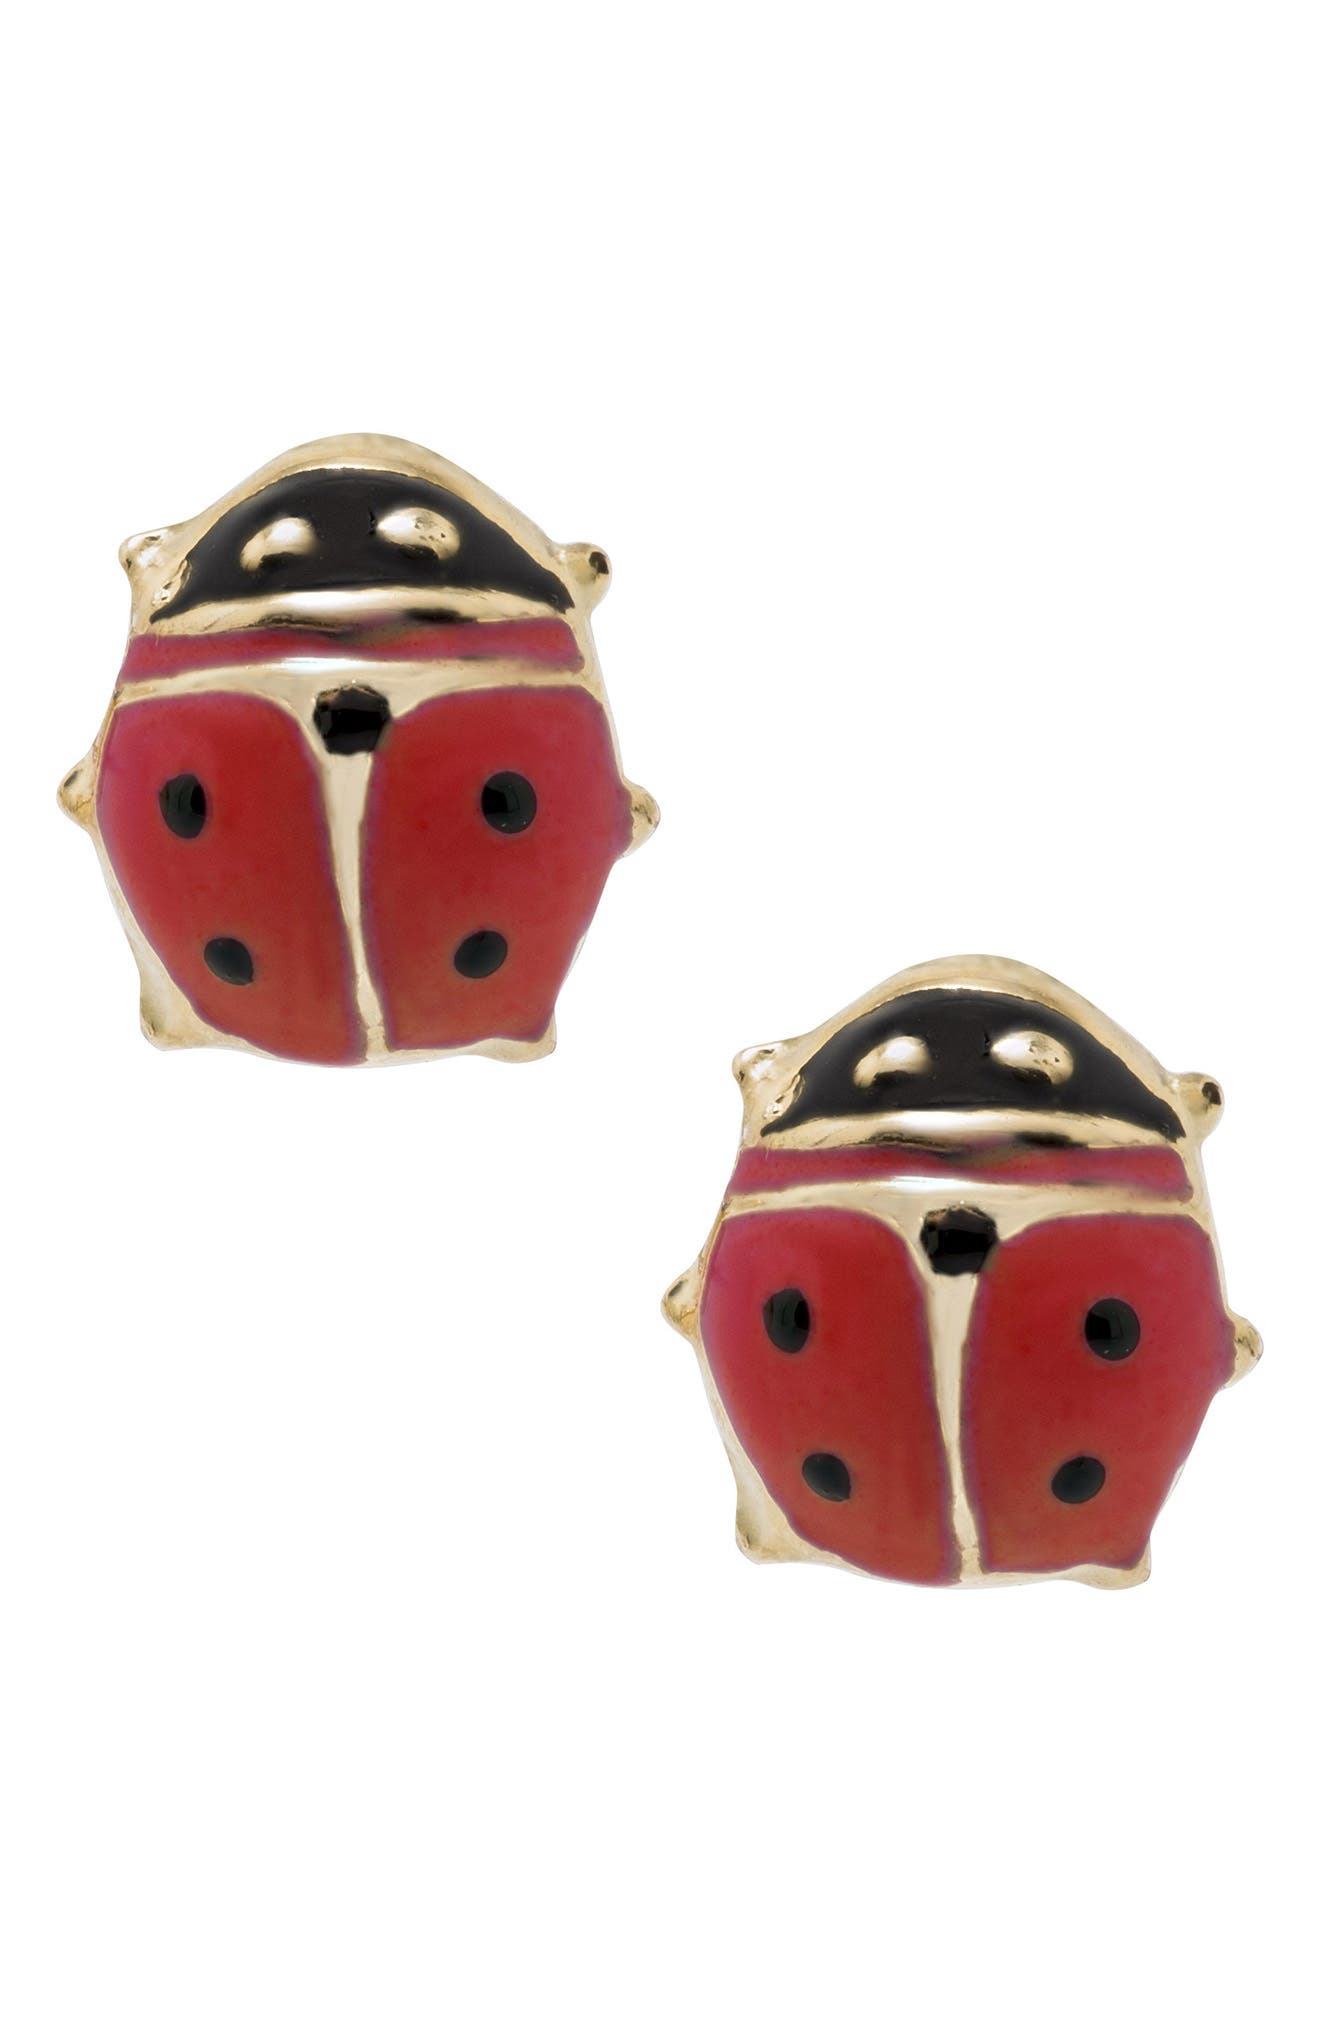 14k Gold & Enamel Ladybug Earrings,                             Main thumbnail 1, color,                             RED/ GOLD